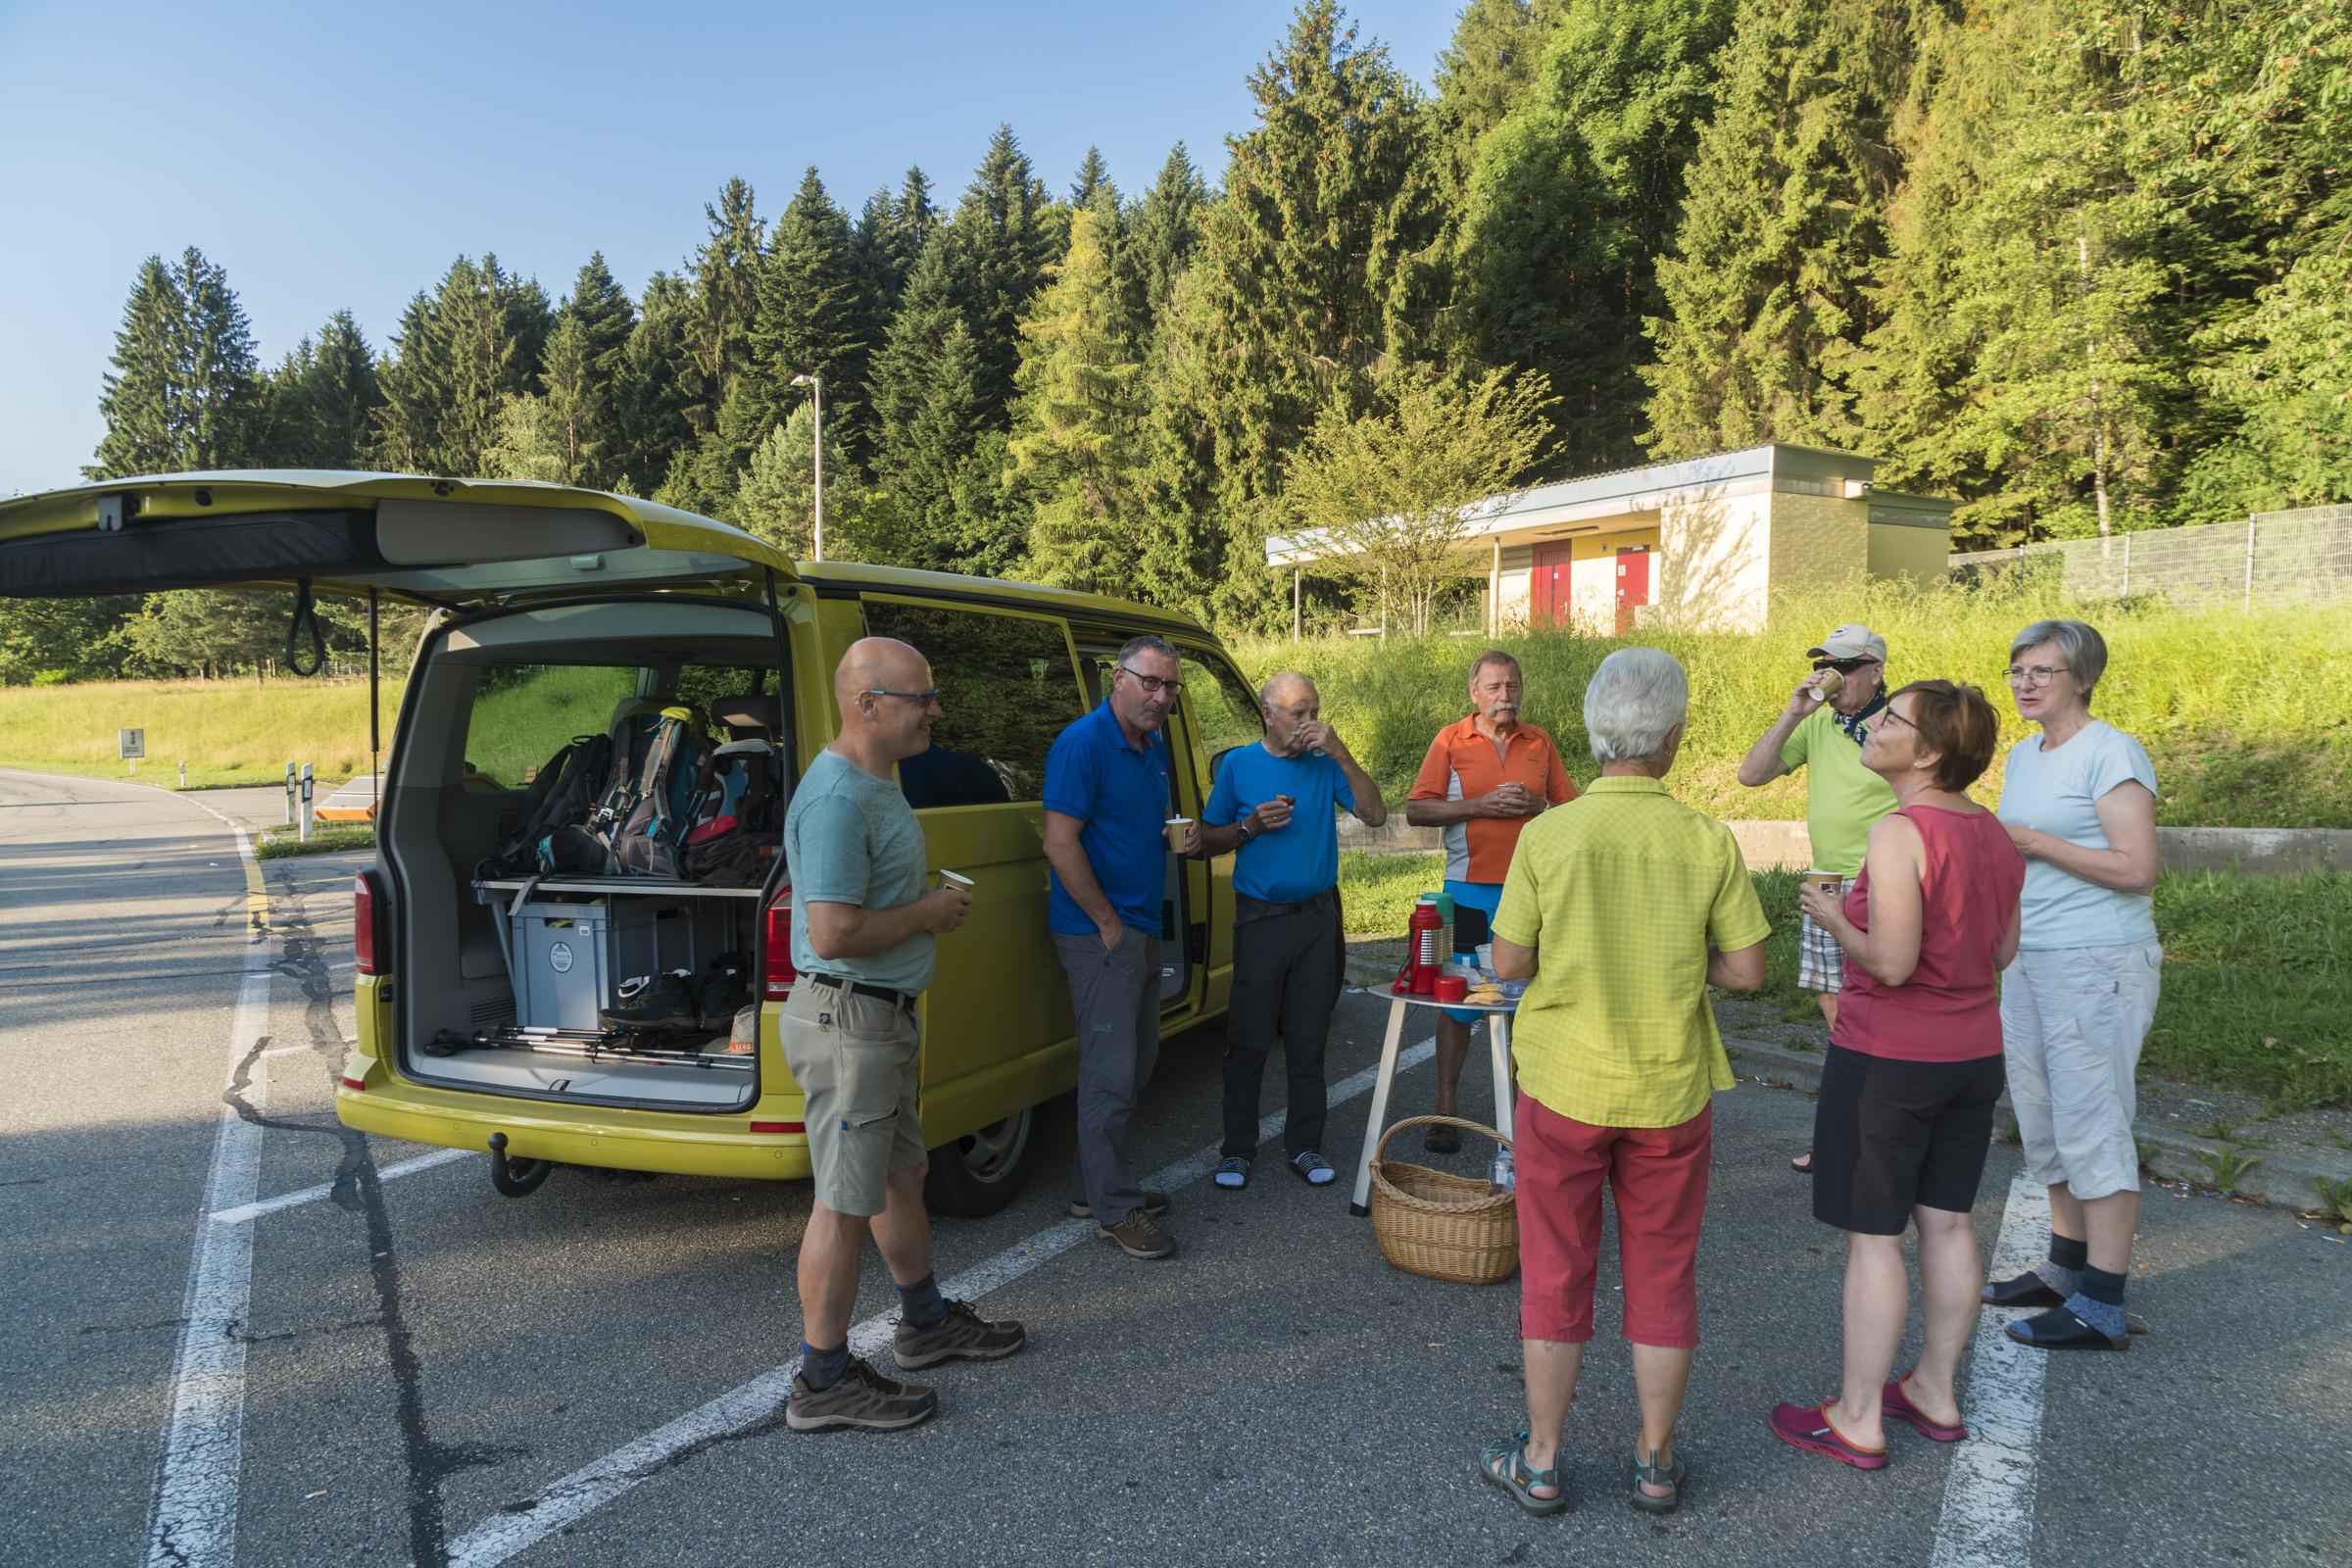 Wanderung zum Seebergsee 30.06.2019